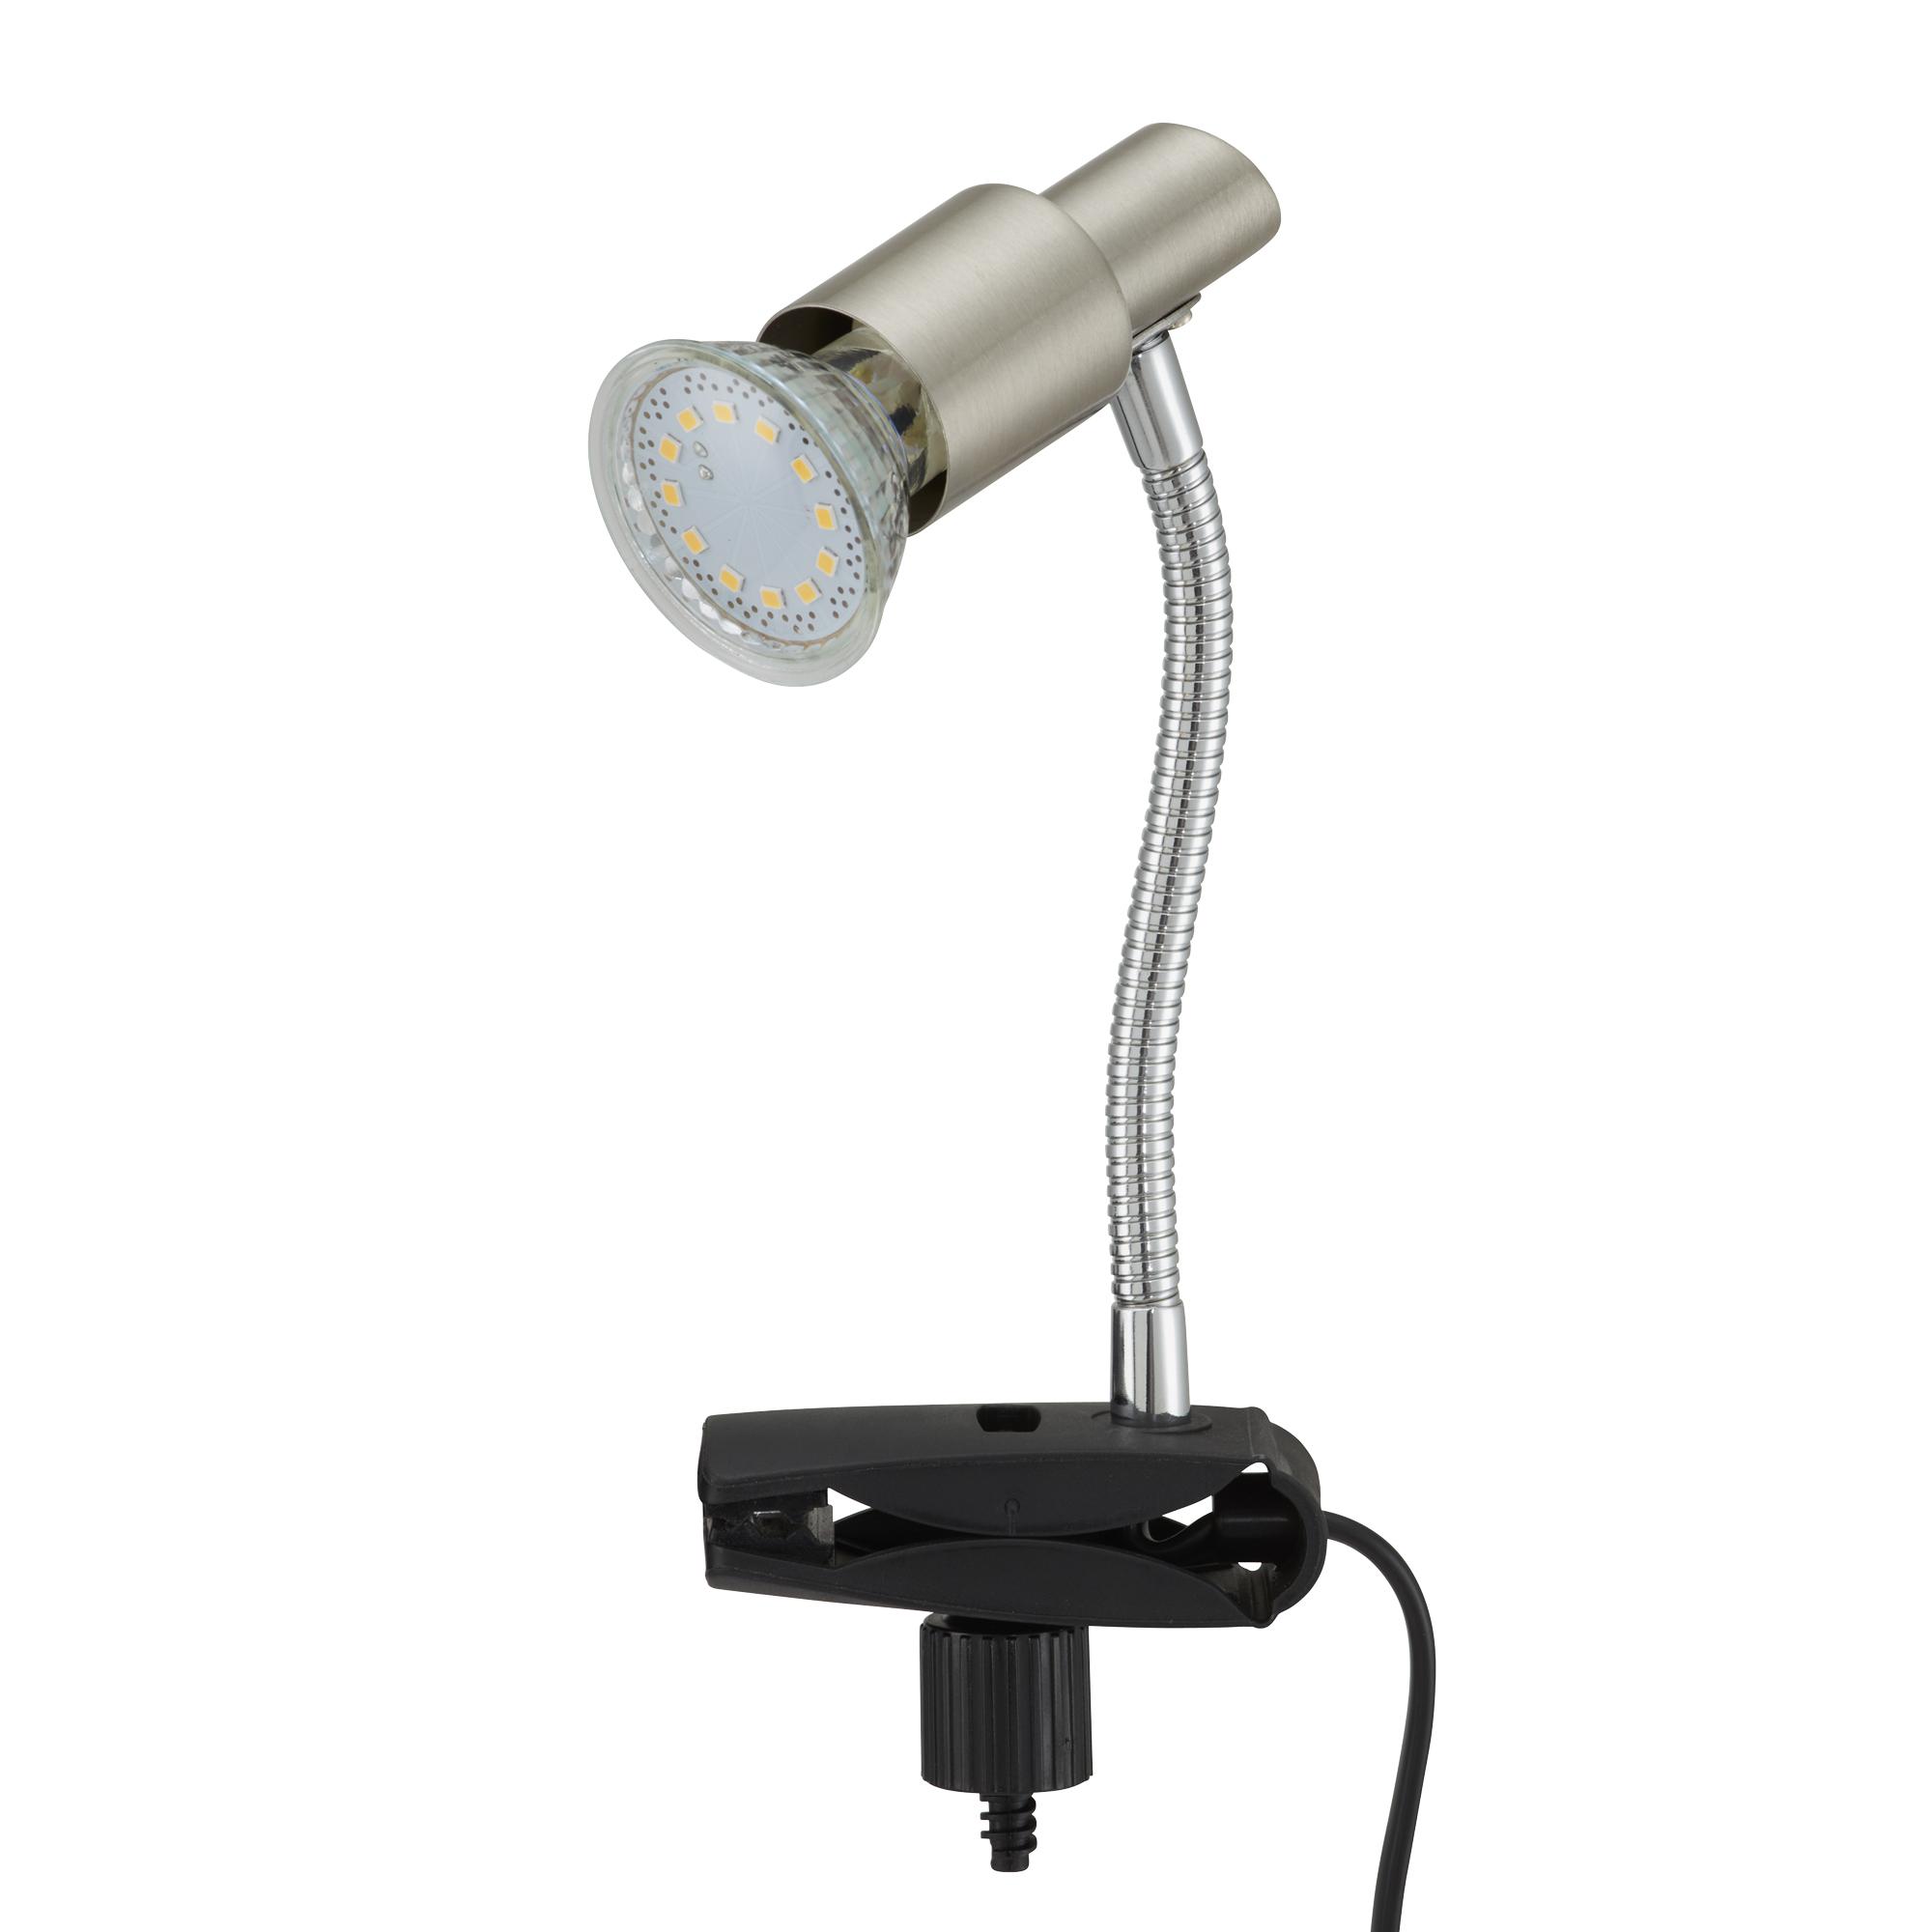 LED Klemmleuchte, 3,5 cm, 3 W, Matt-Nickel